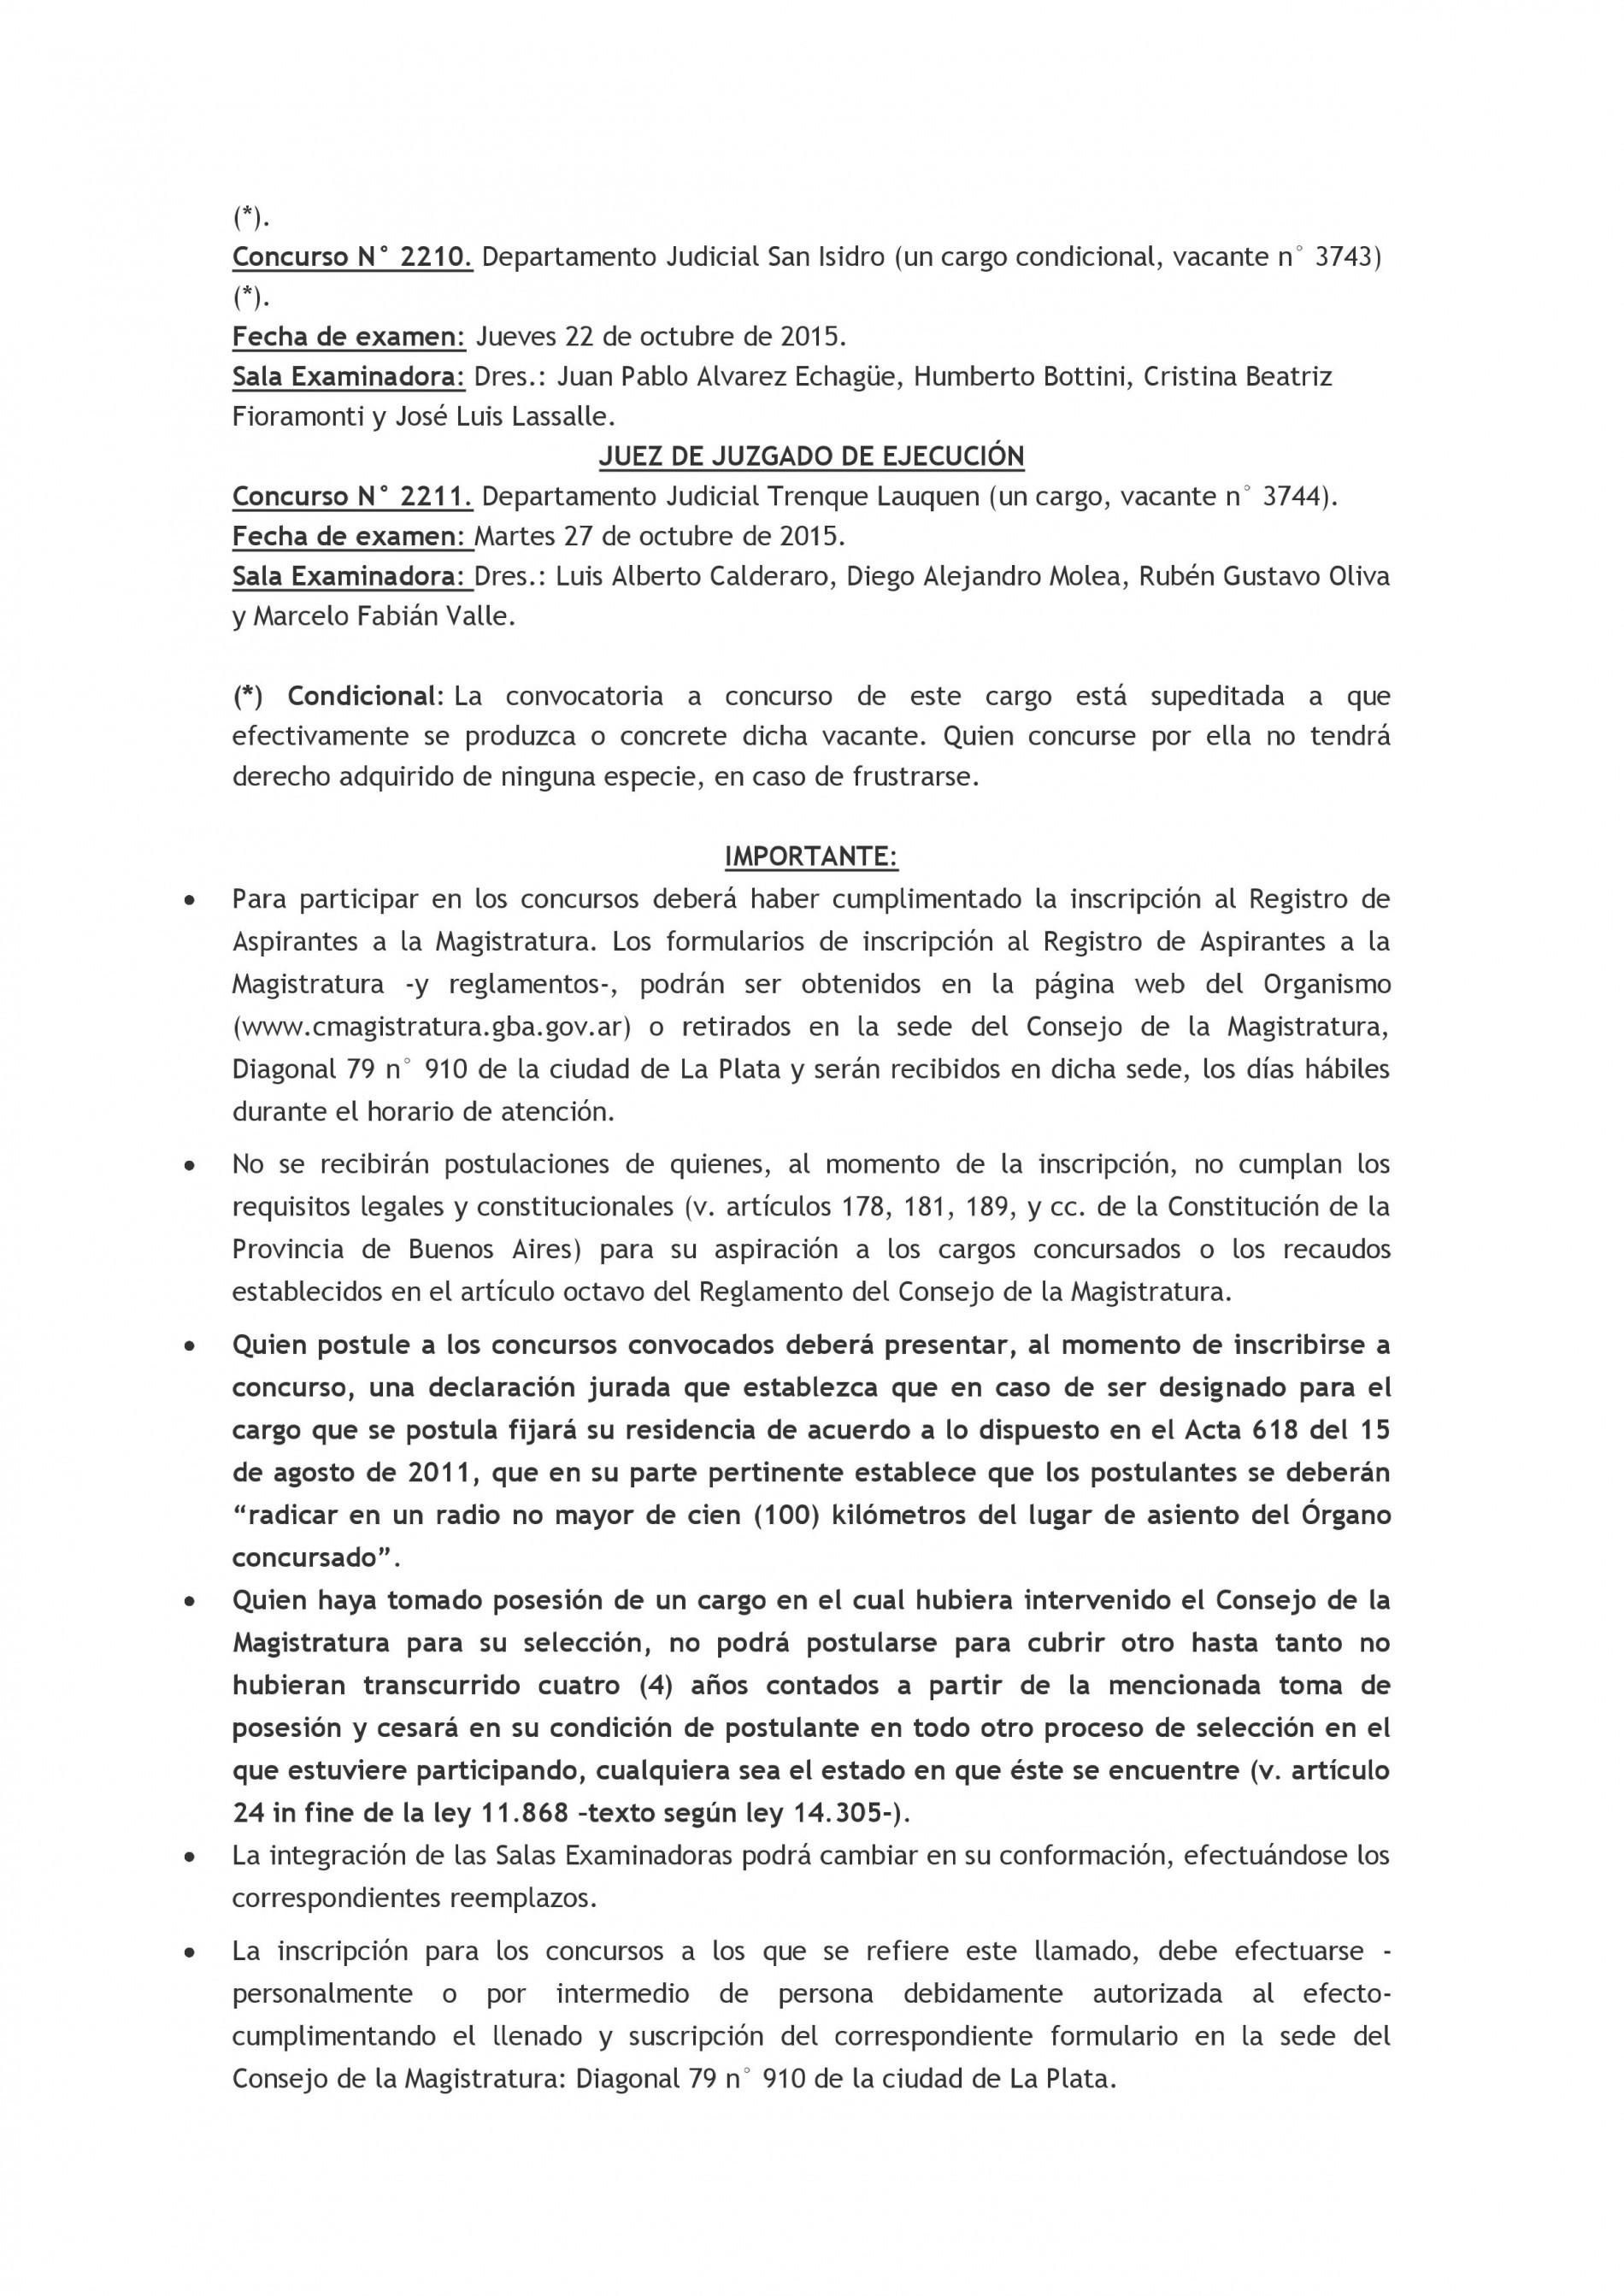 Consejo de la Magistratura Bonaerense (nueva convocatoria)